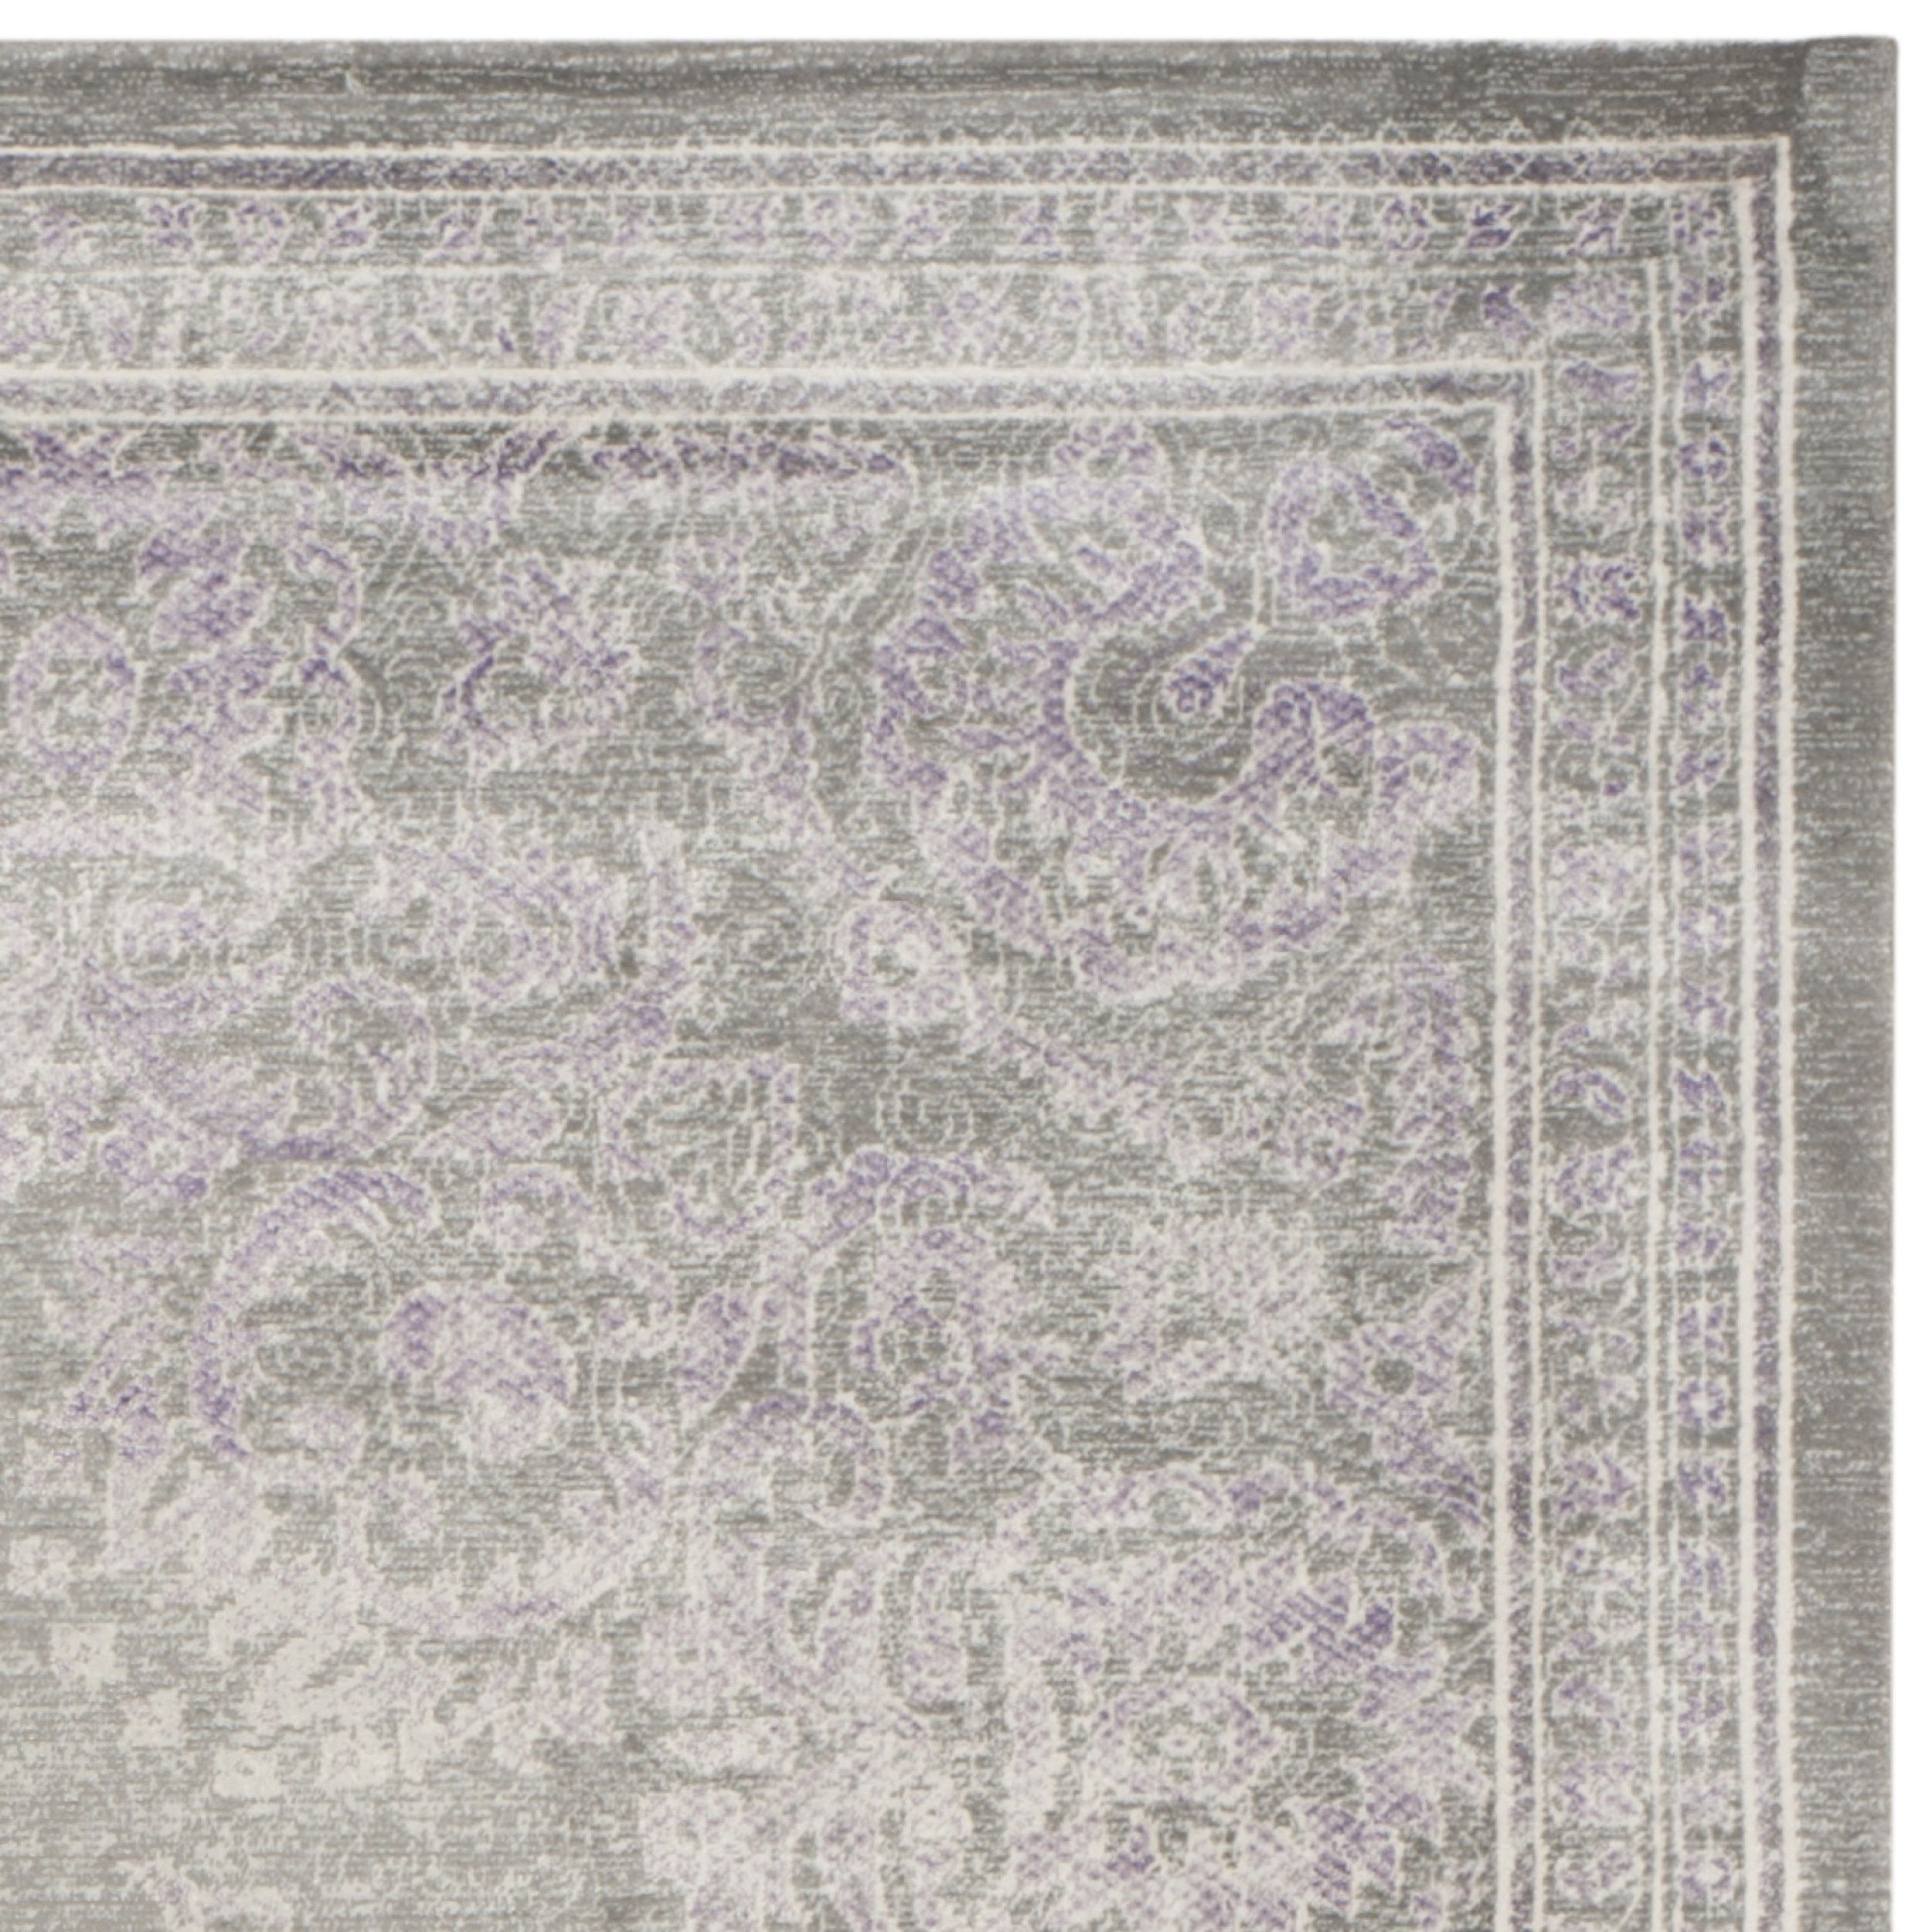 Rawhide Ivory Rug 6u00272 X Delphine Sage Wool